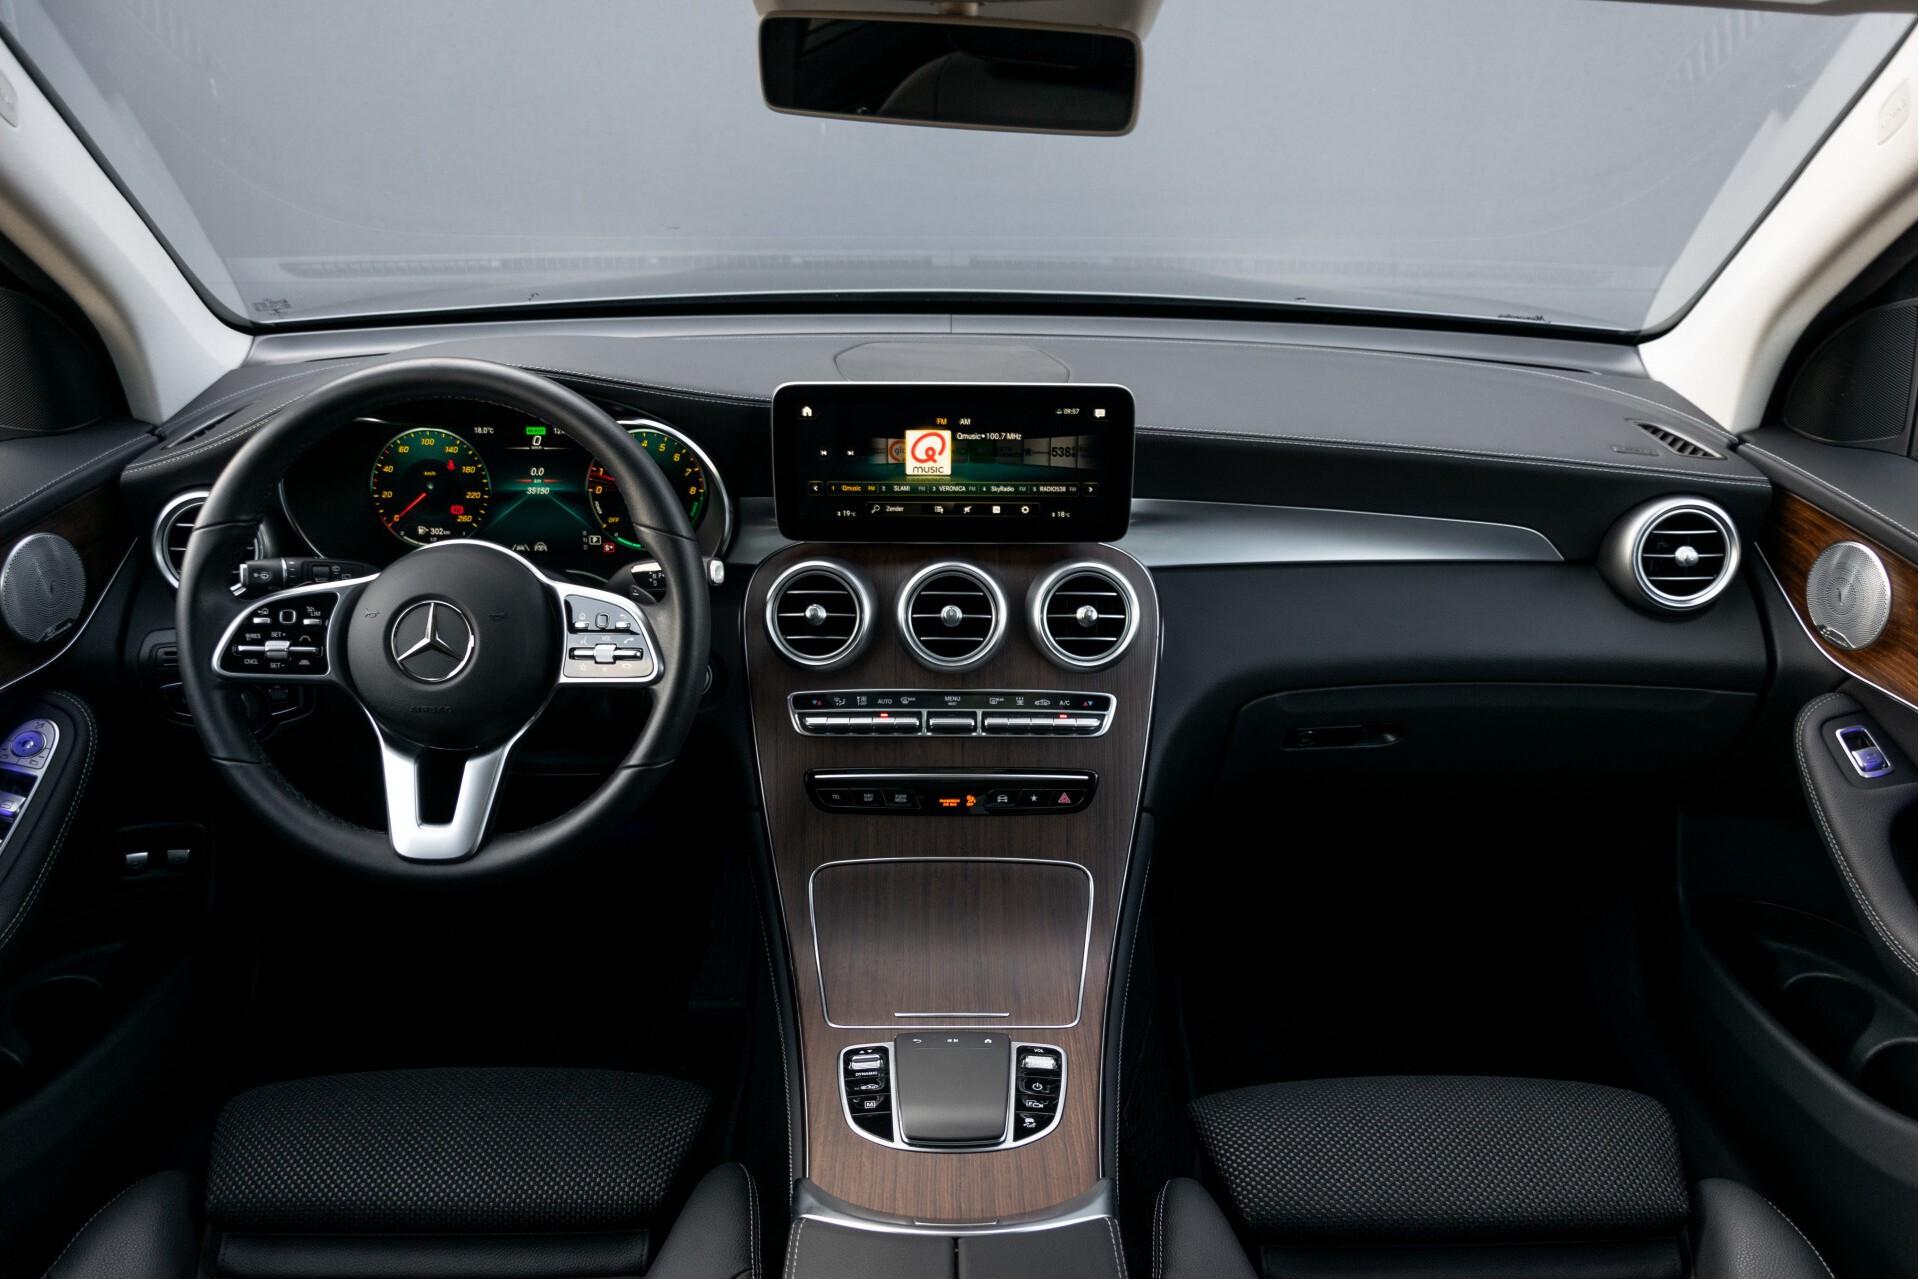 Mercedes-Benz GLC 300e 4-M Luchtvering/Panorama/Multicontourstoelen/Rij-assistentie/Standkachel Aut9 Foto 9